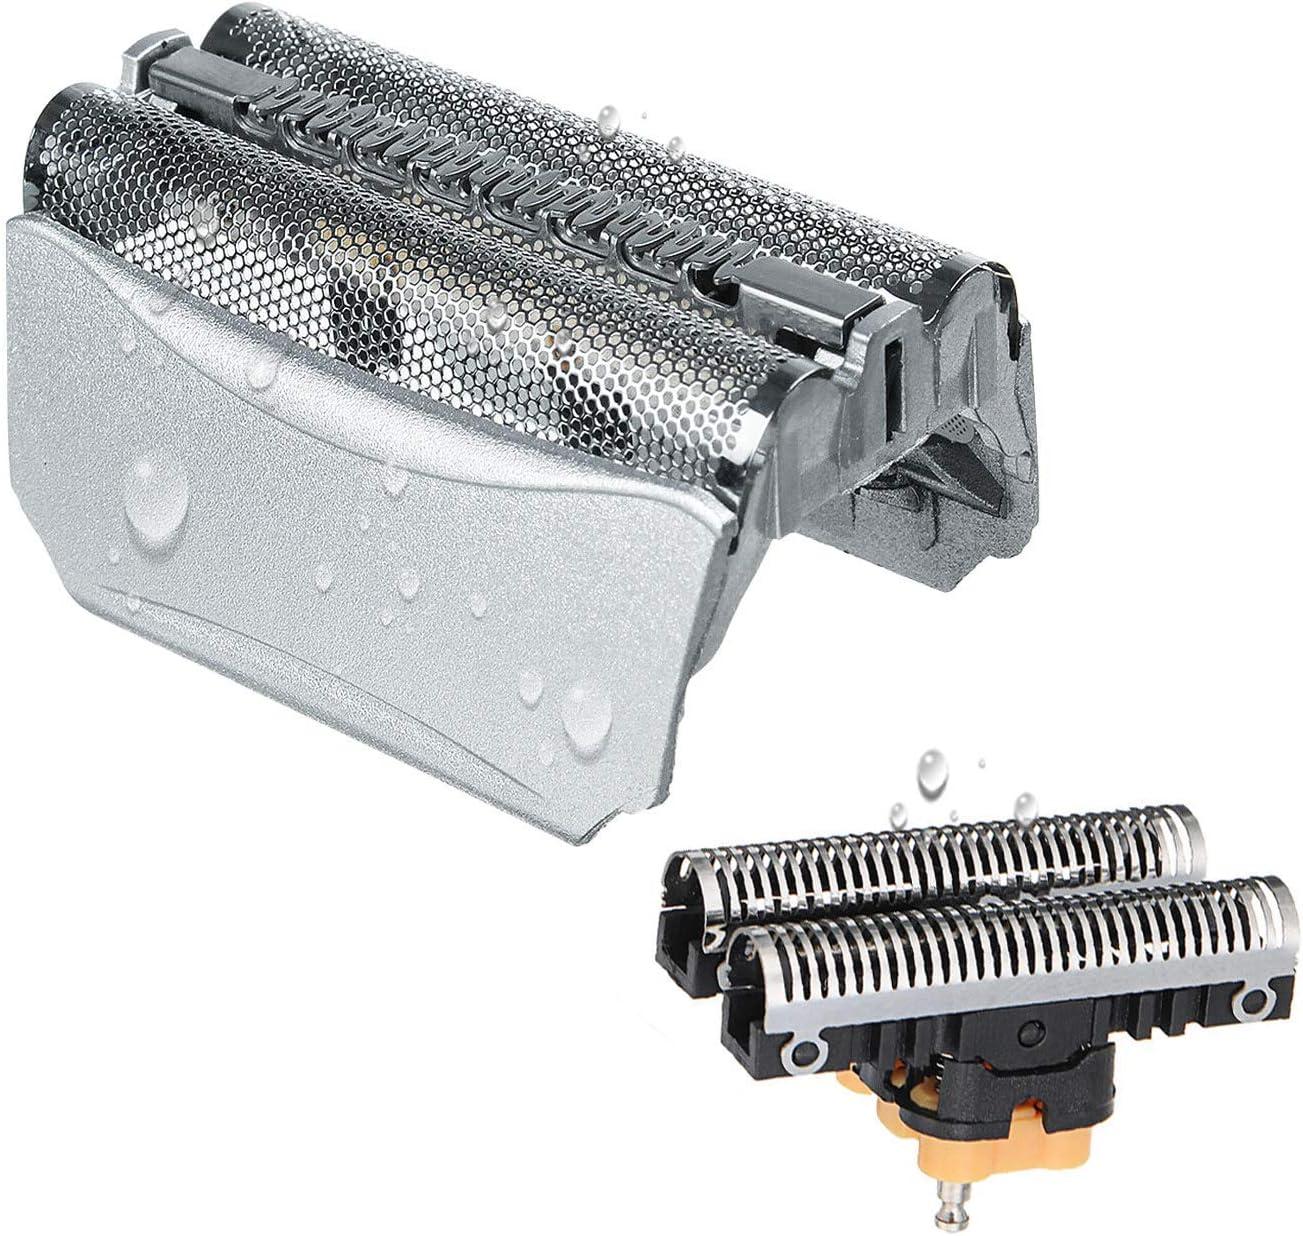 51S Cabezales de Afeitado para Braun Afeitadora Eléctrica Hombre, Poweka Series 5 Recambio de Lámina y Cuchillas Compatible con Braun 8000 Series 360 Complete Activator ContourPro